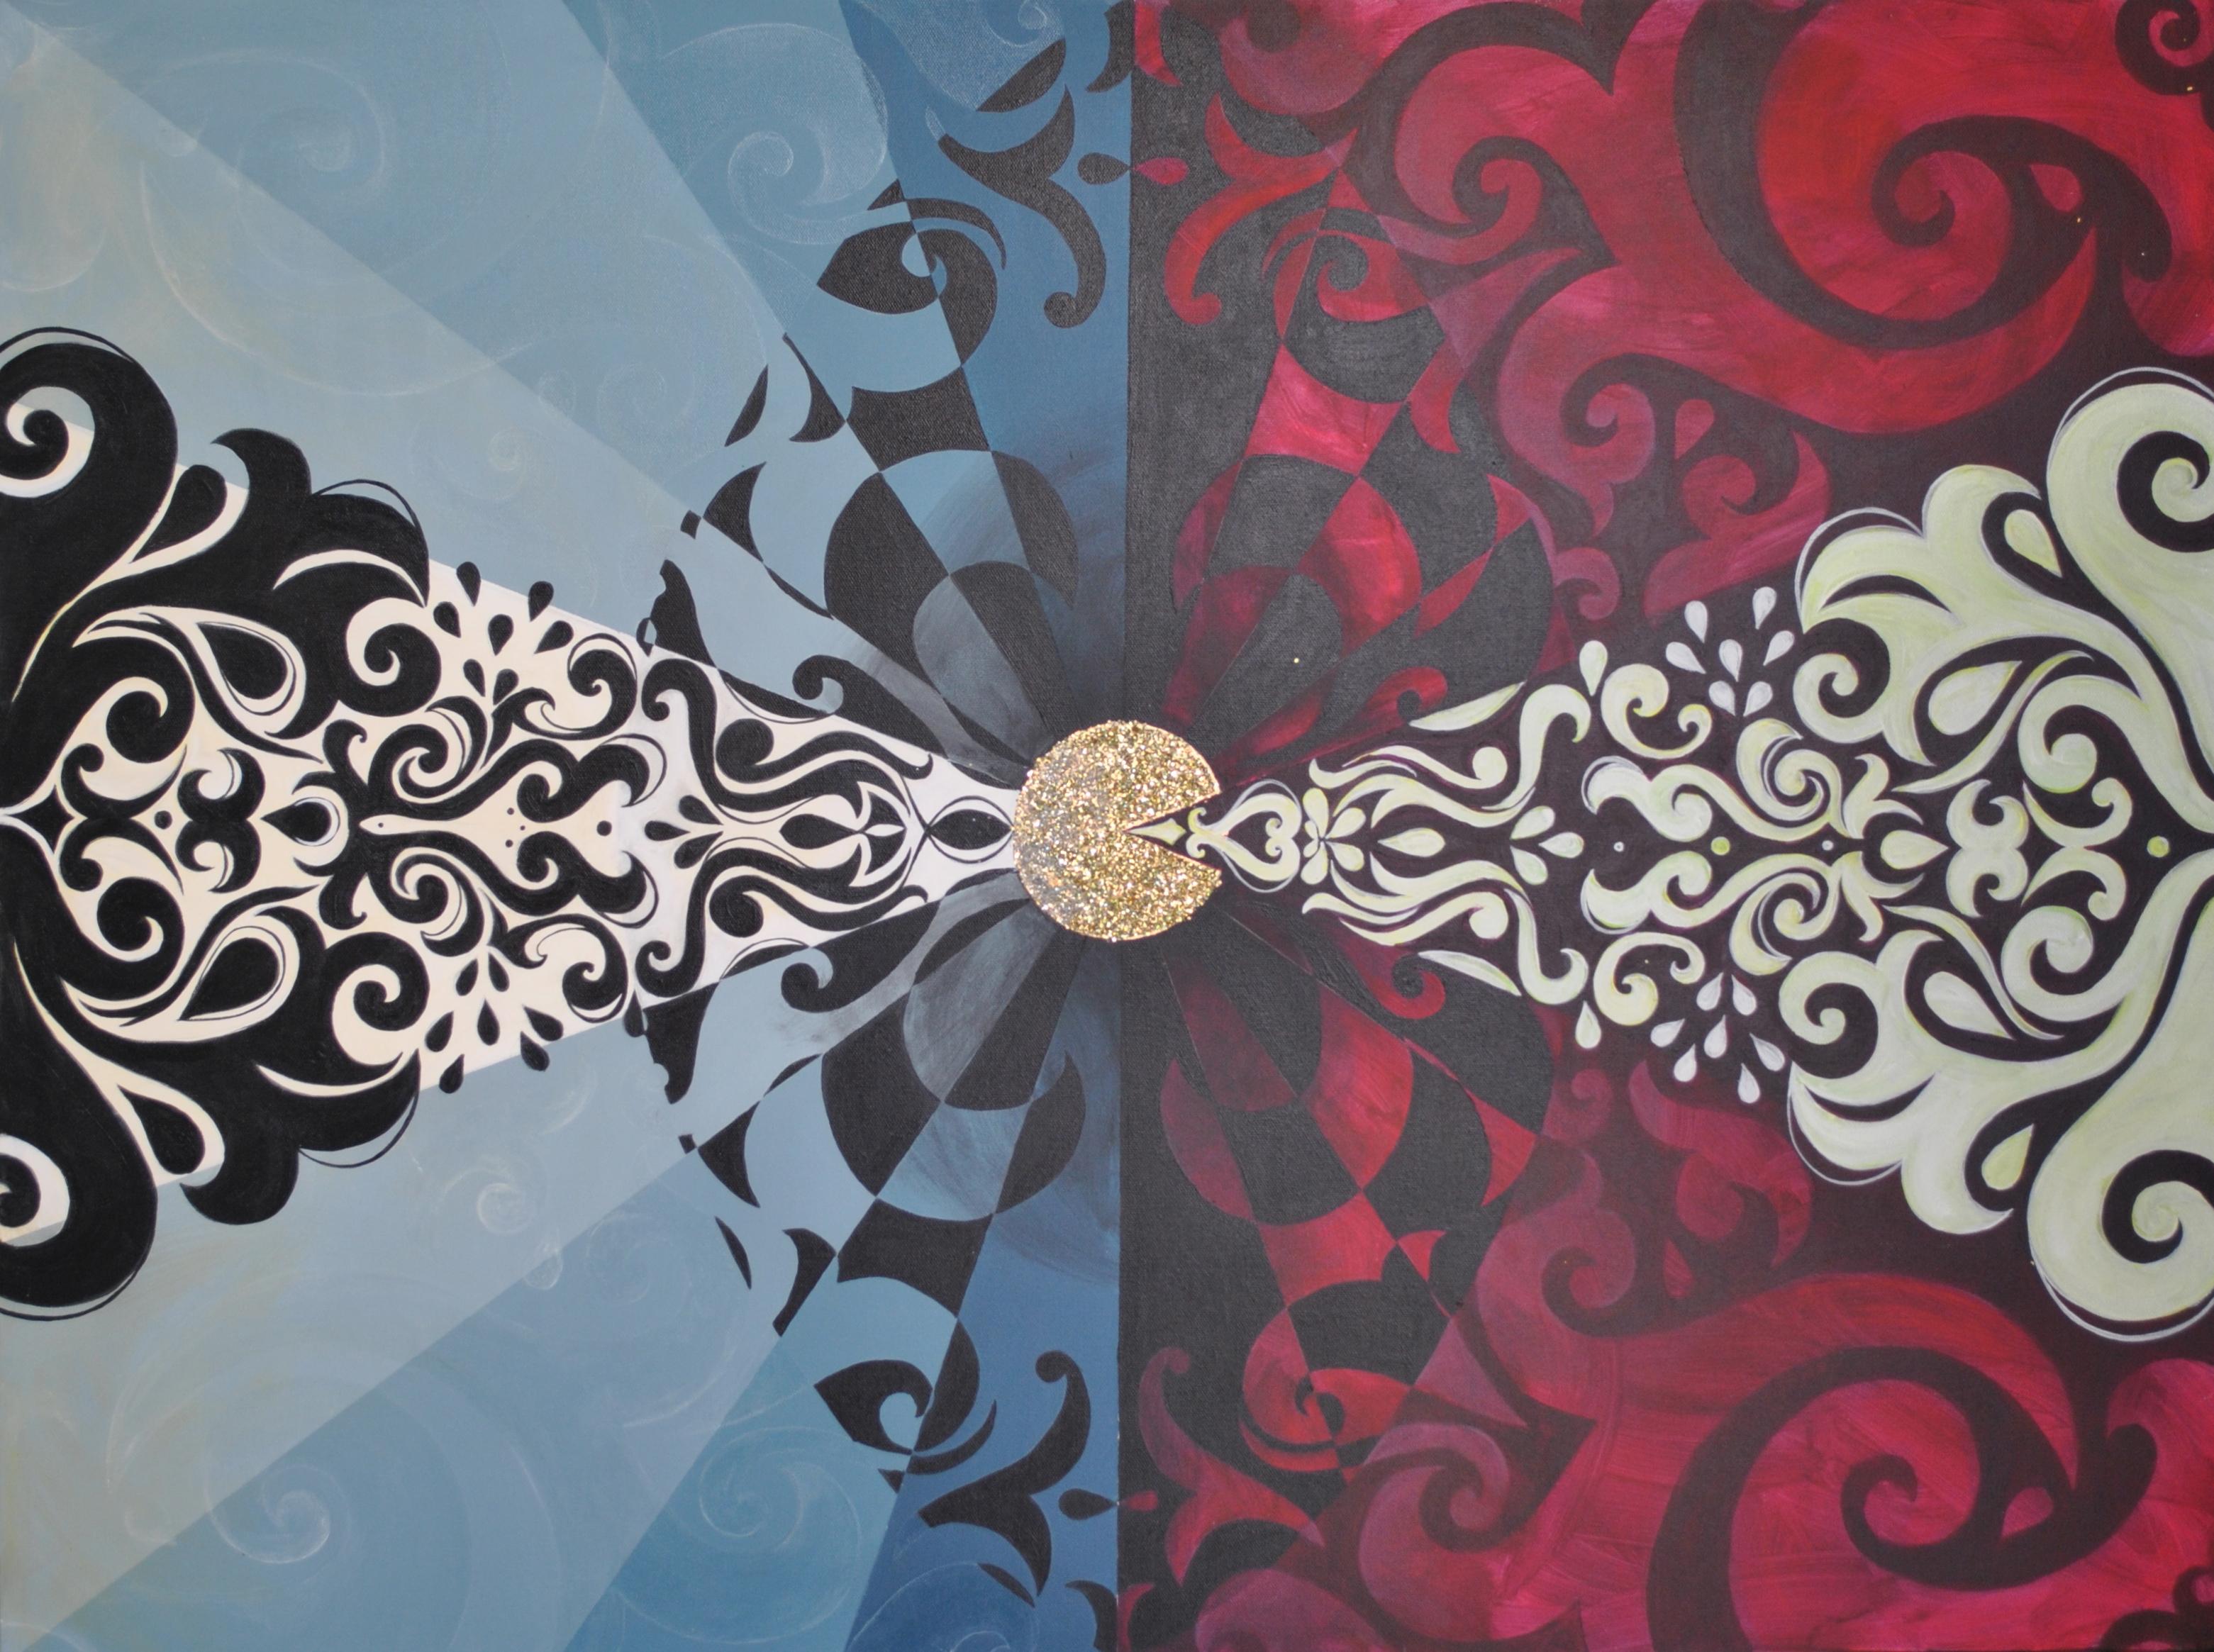 Vesica Pisces - Saba Barnard - Acrylic paint and glitter 700.00